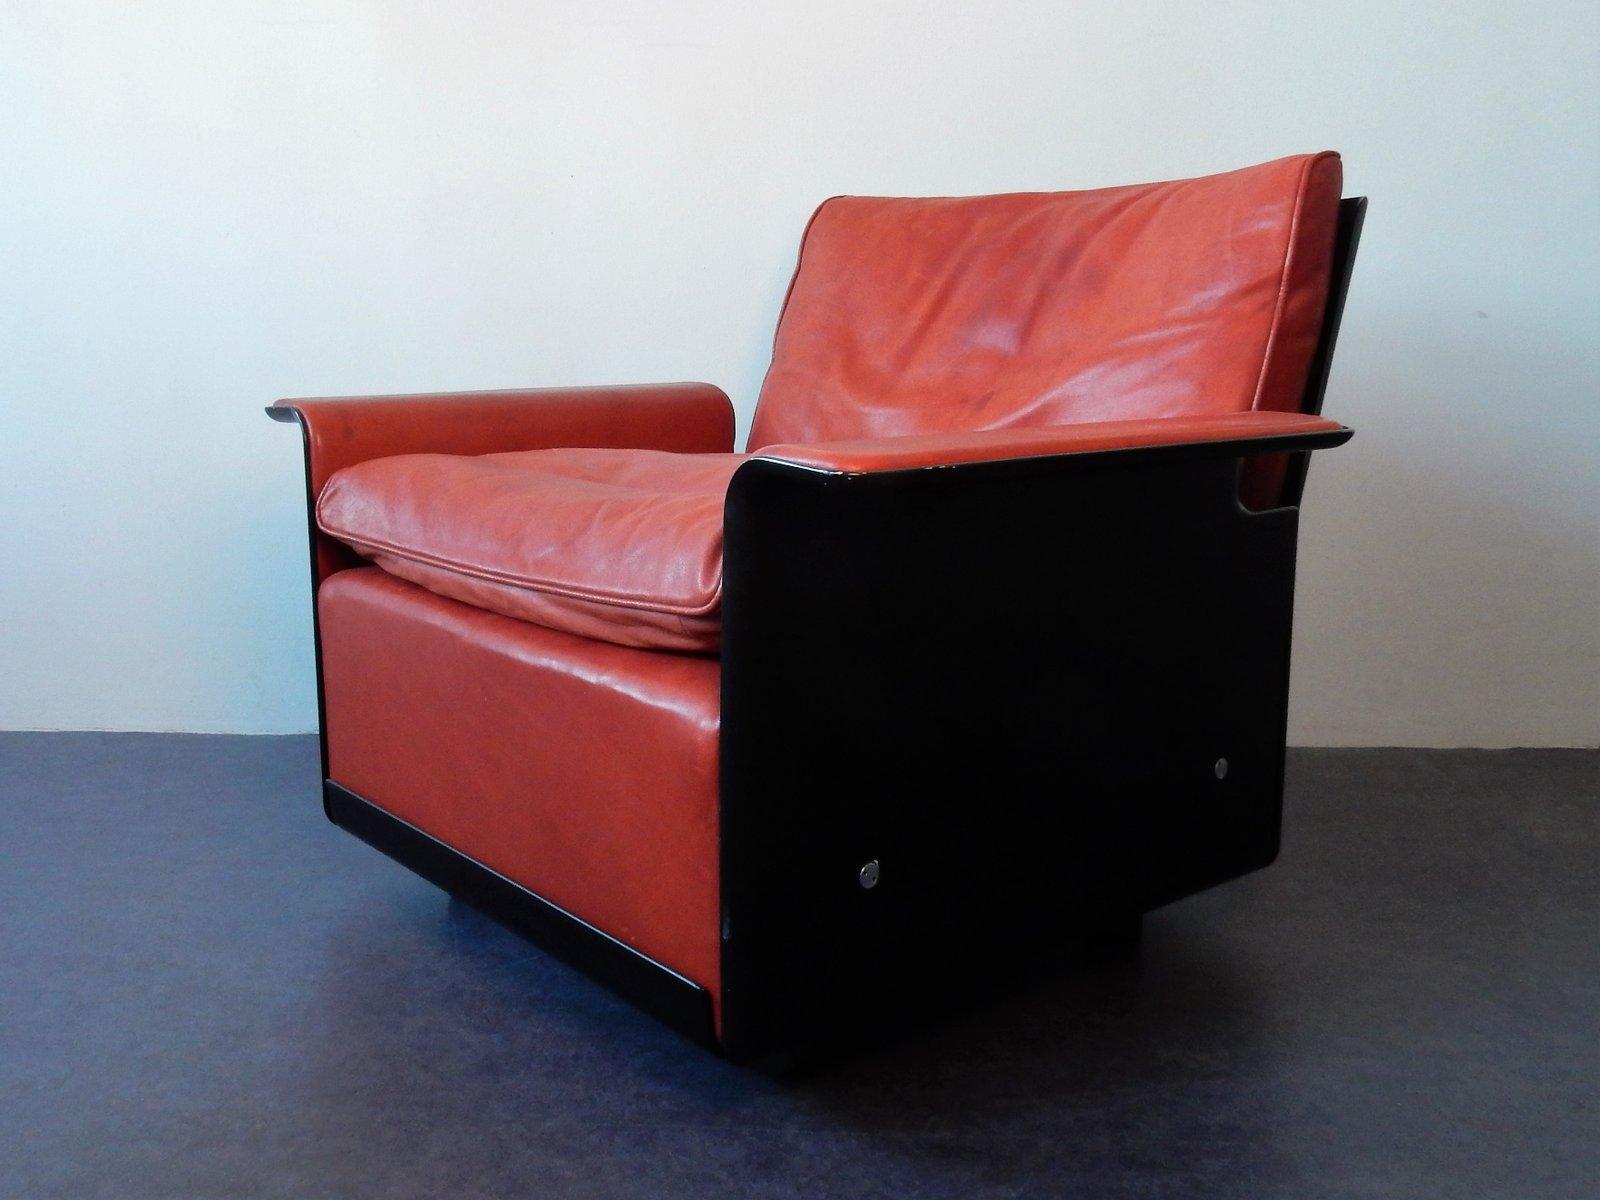 sessel von dieter rams f r vitsoe 1966 bei pamono kaufen. Black Bedroom Furniture Sets. Home Design Ideas